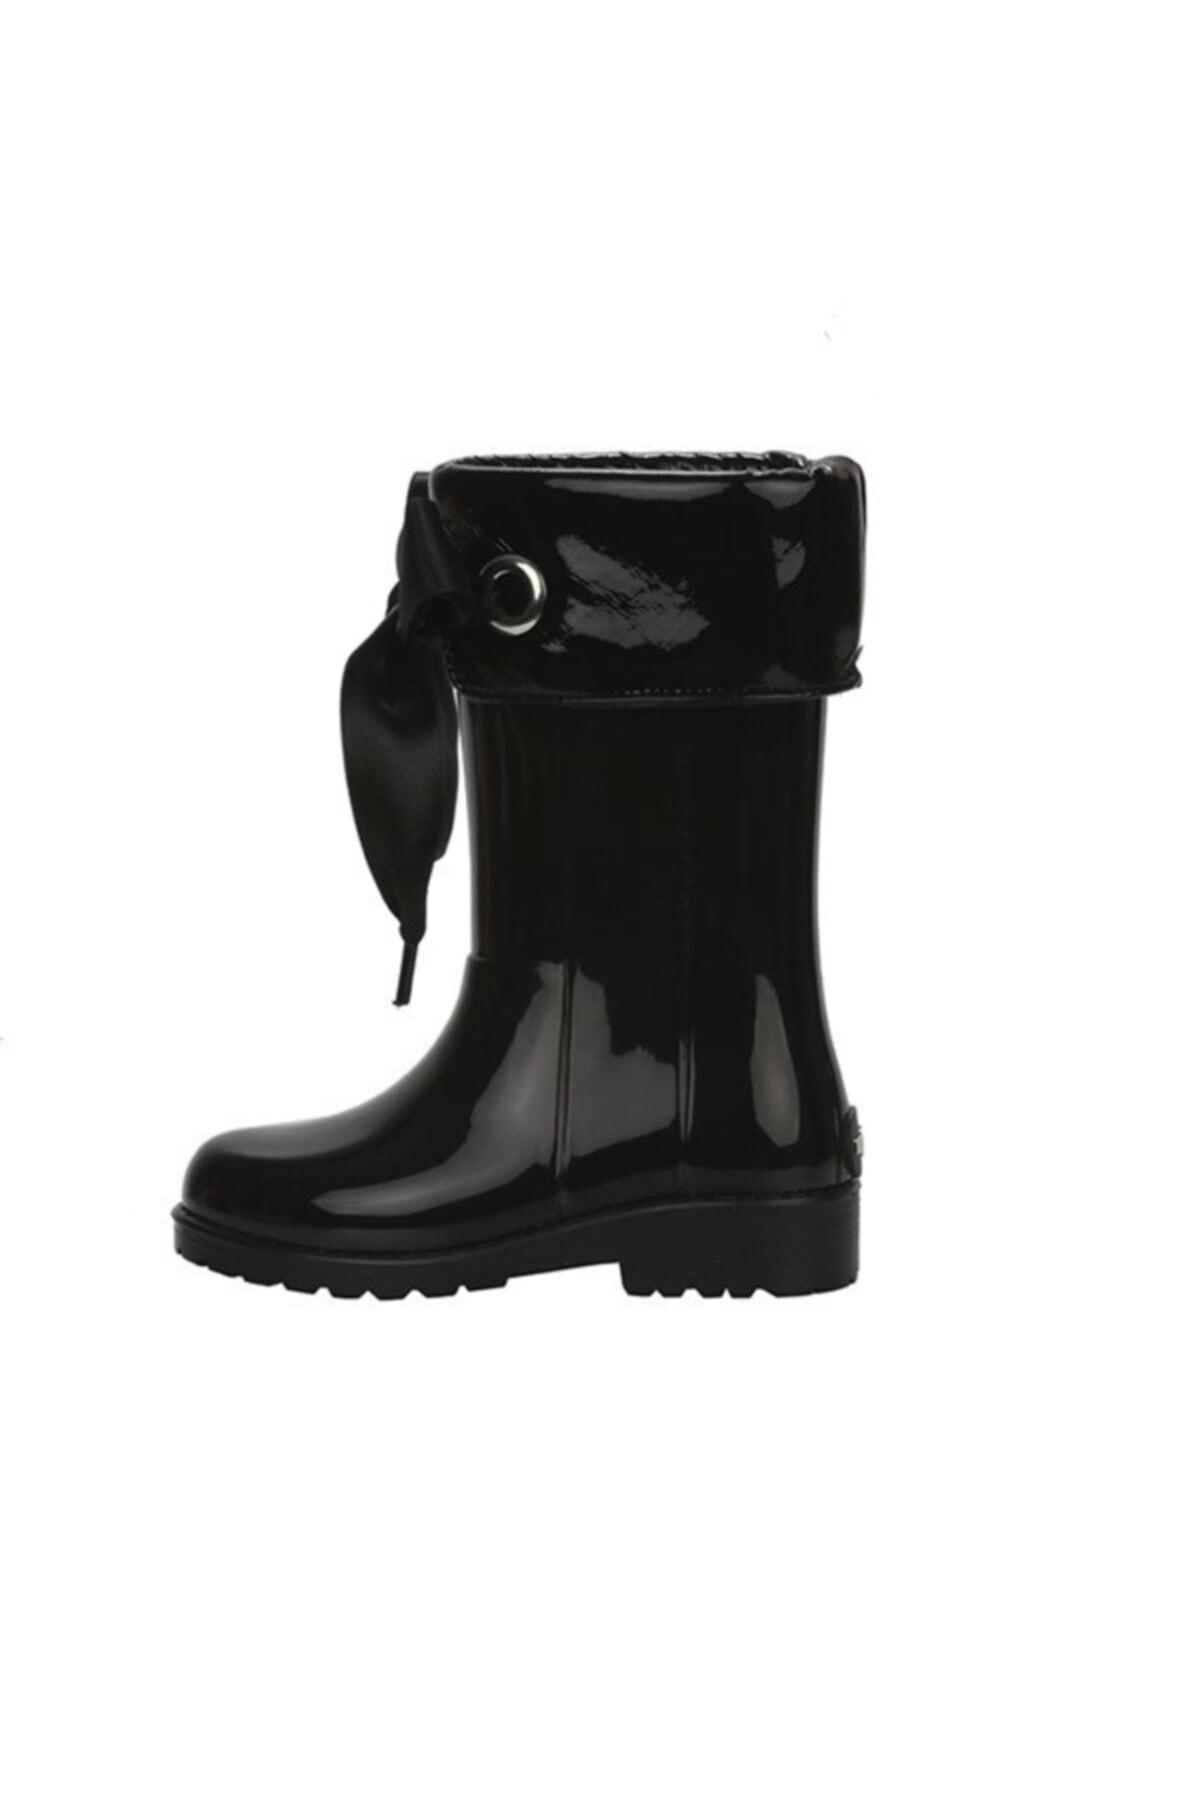 IGOR Campera Charol Yağmur Çizmesi - Siyah 1